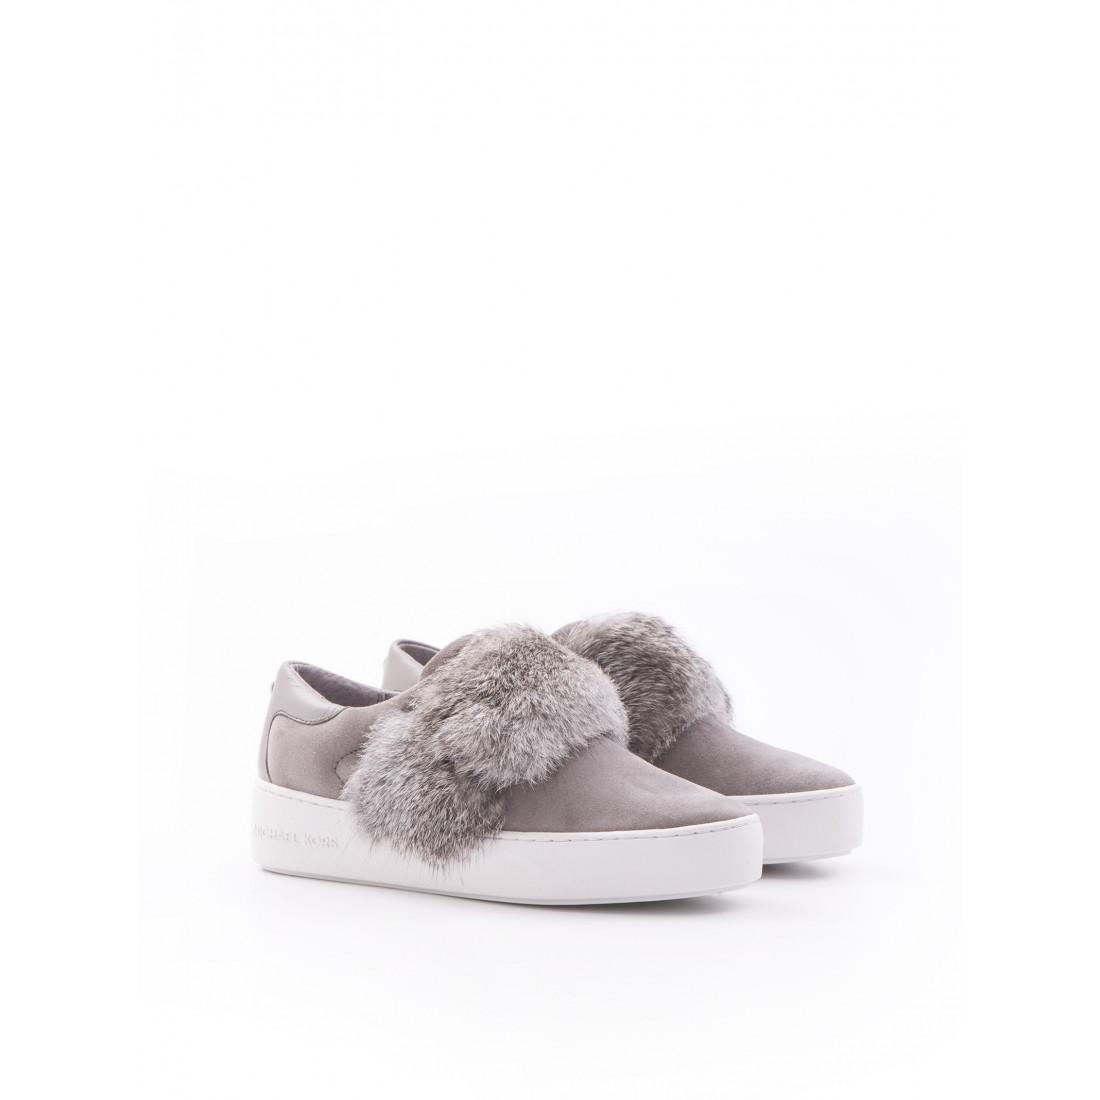 sneakers woman michael kors 43f6mvfp1s081 maven pearl grey 947